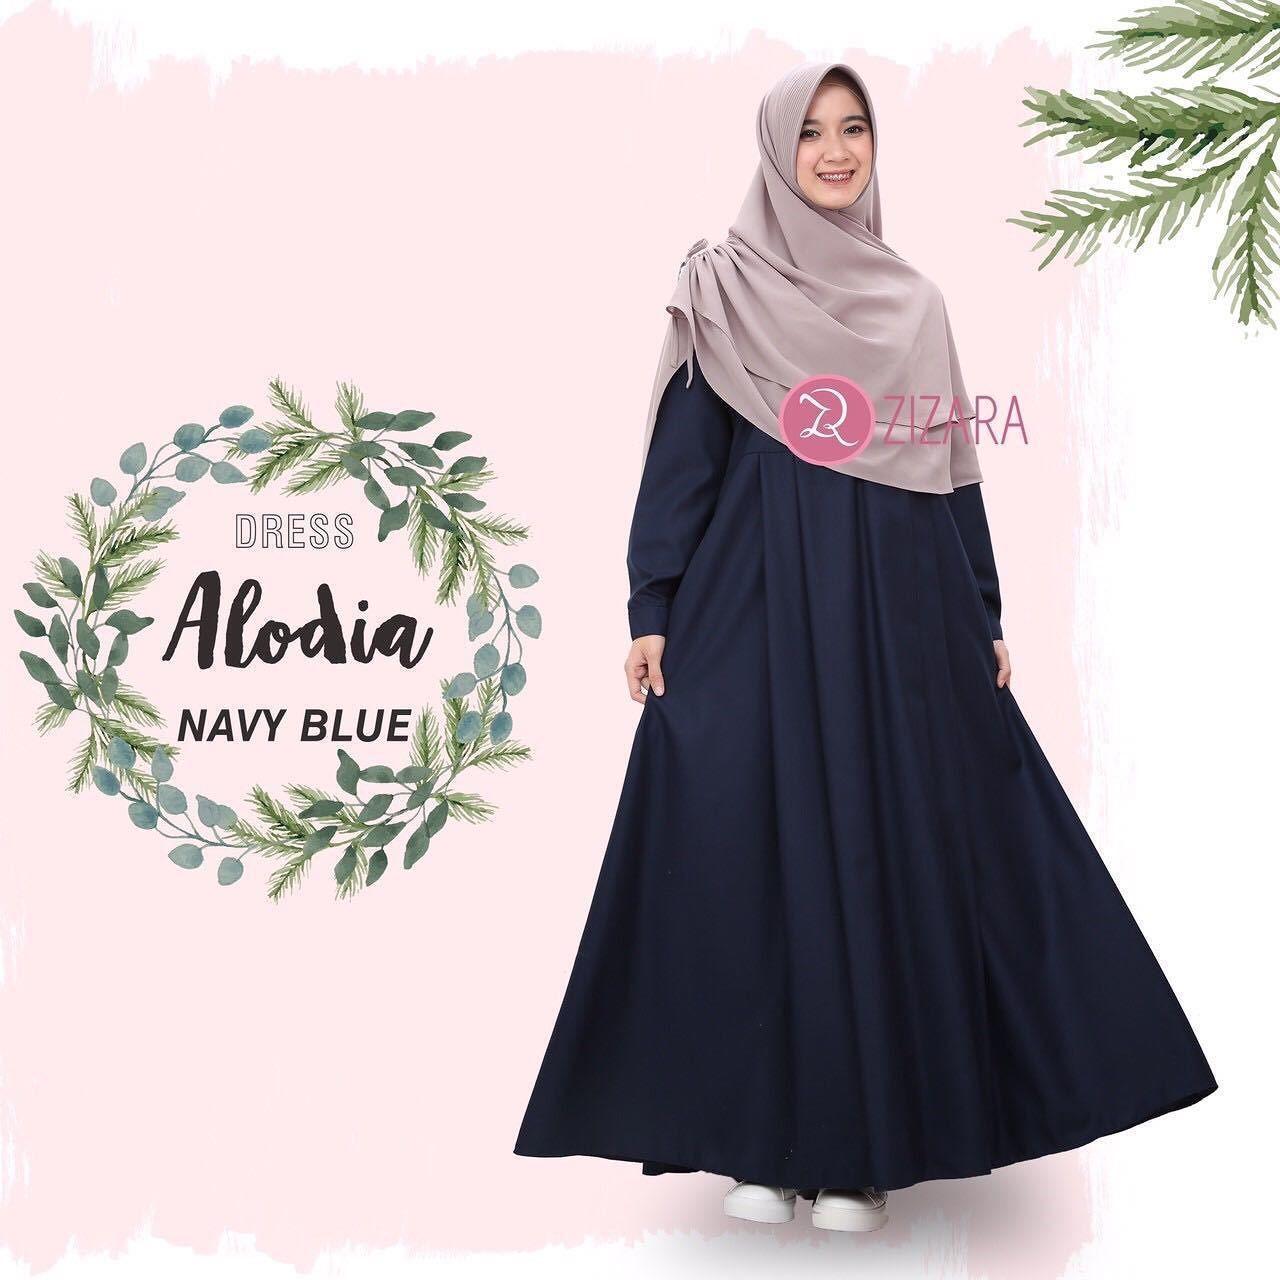 Gamis Zizara Alodia Dress Navy Blue - baju muslim wanita baju